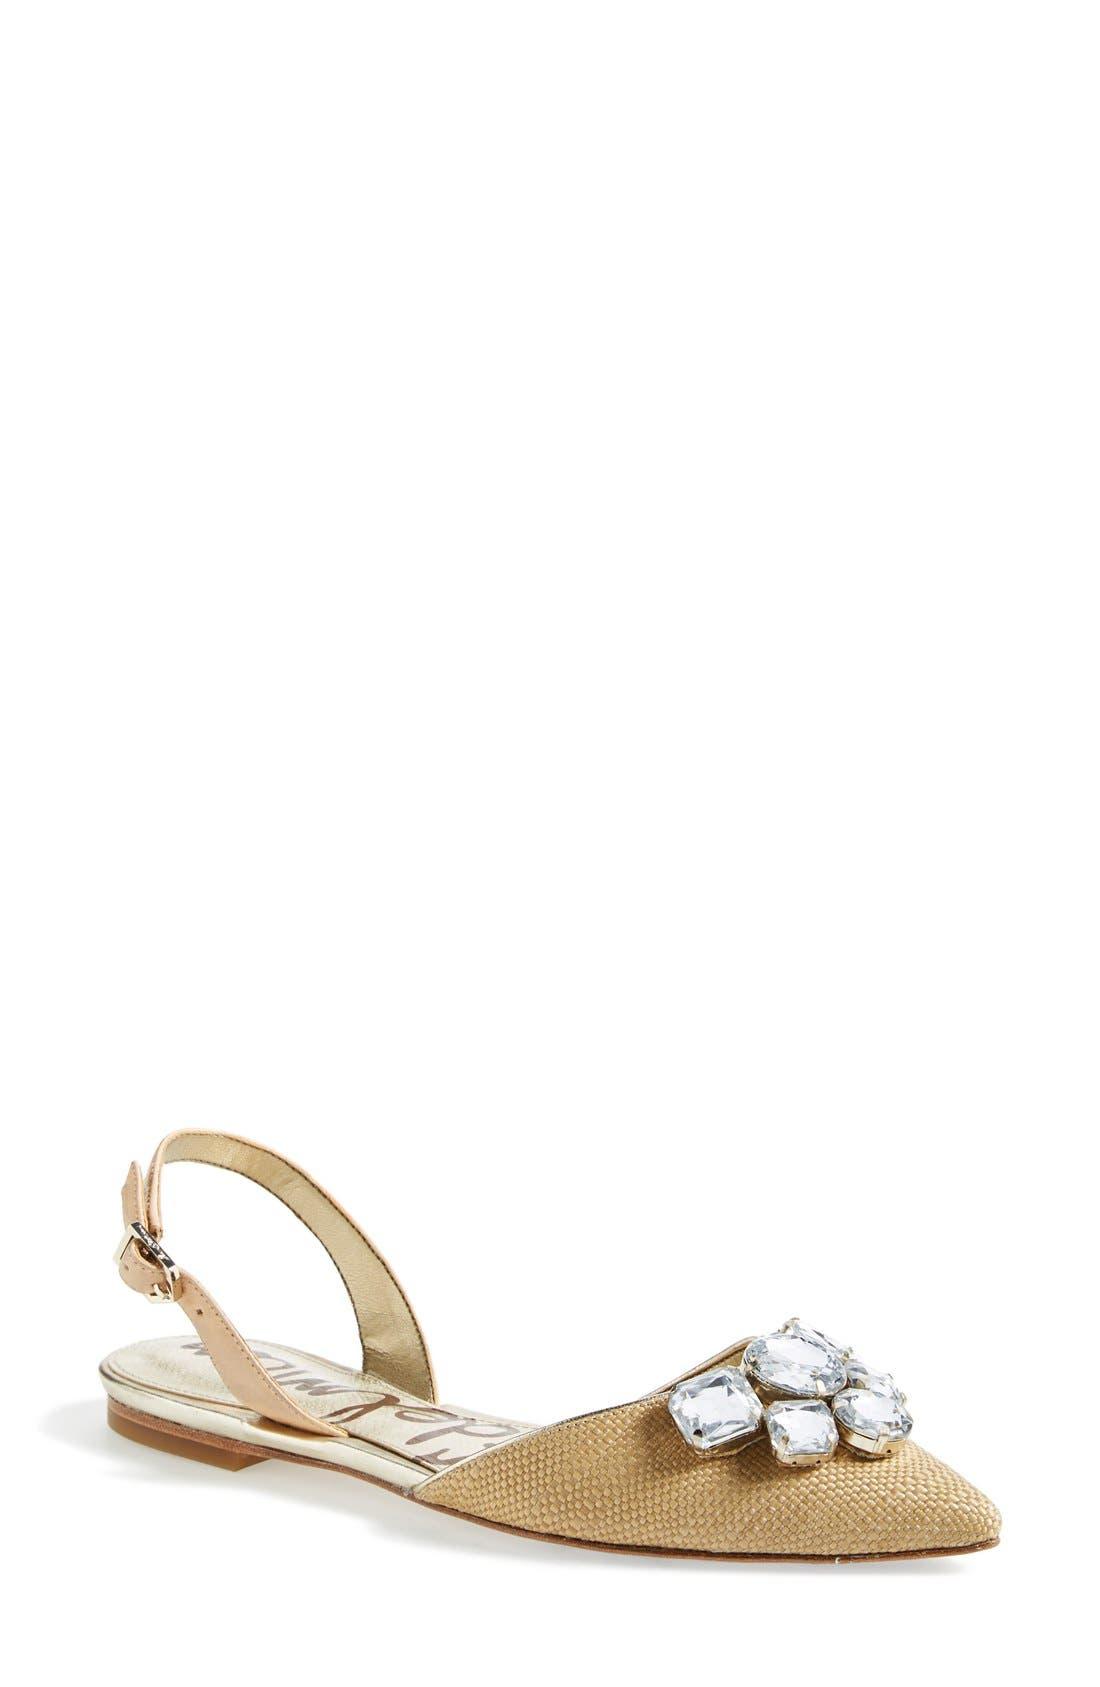 Main Image - Sam Edelman 'Reece' Slingback Pointy Toe Flat (Women)